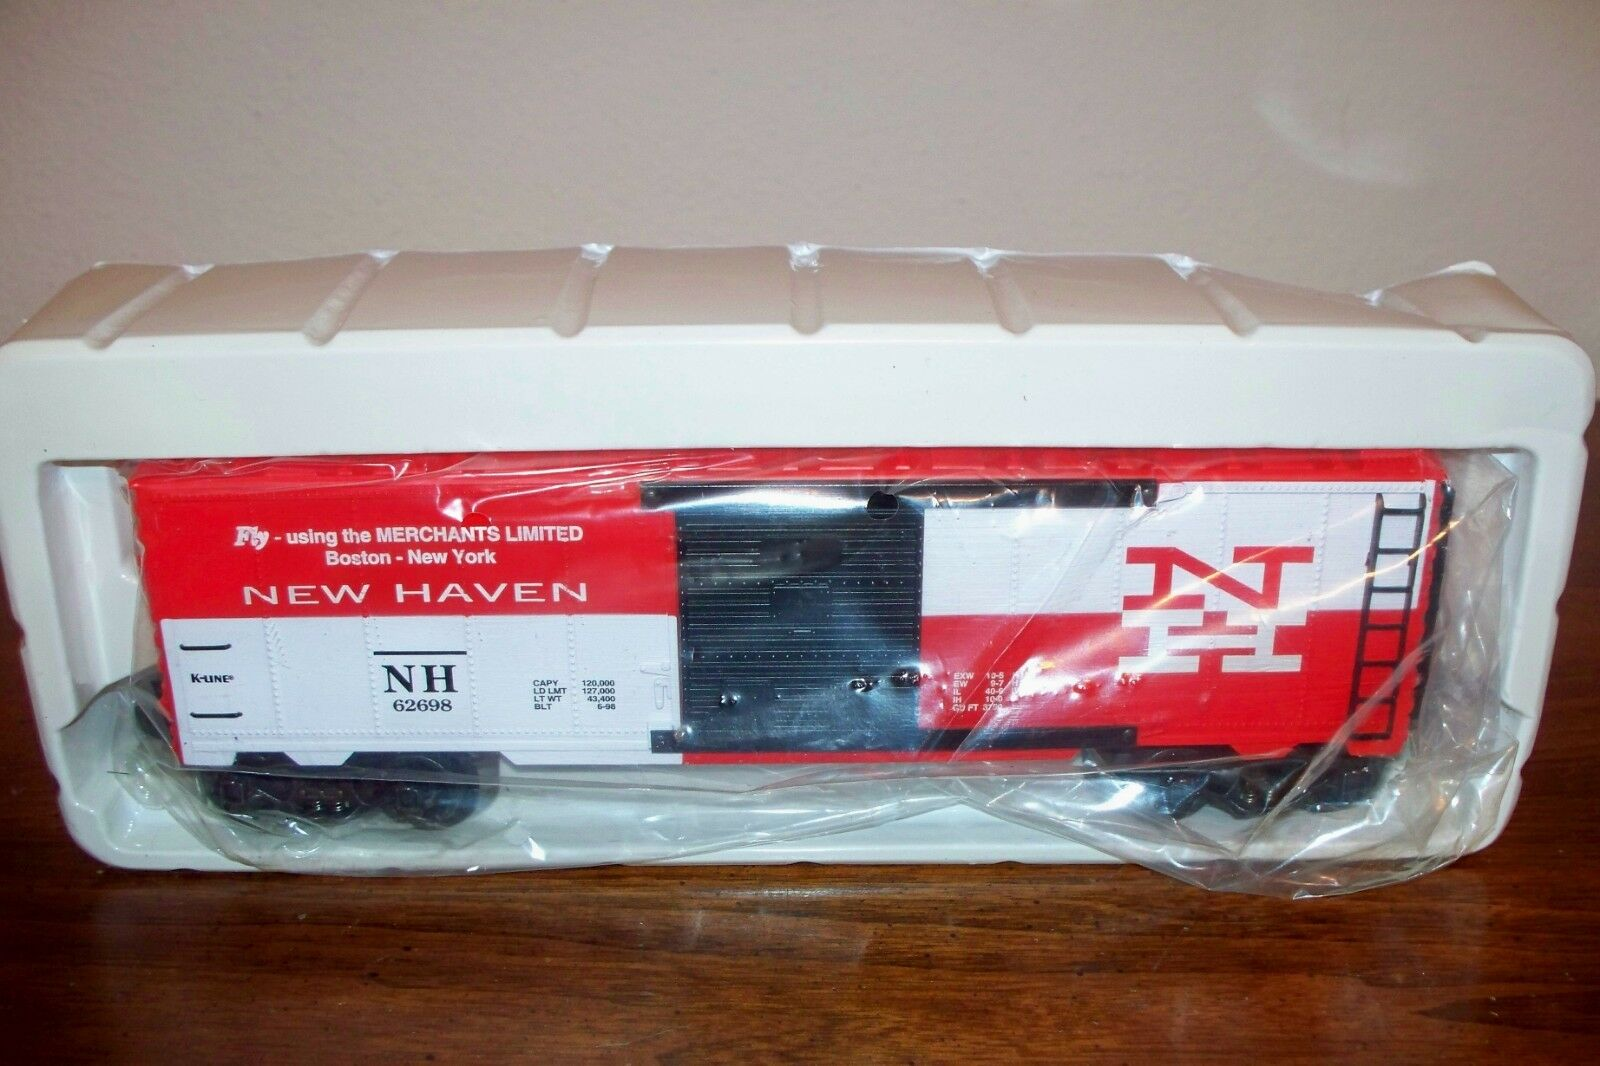 K-LINE TRAIN K641-9017 1998 TCA CONVENTION NEW HAVEN CLASSIC BOX CAR